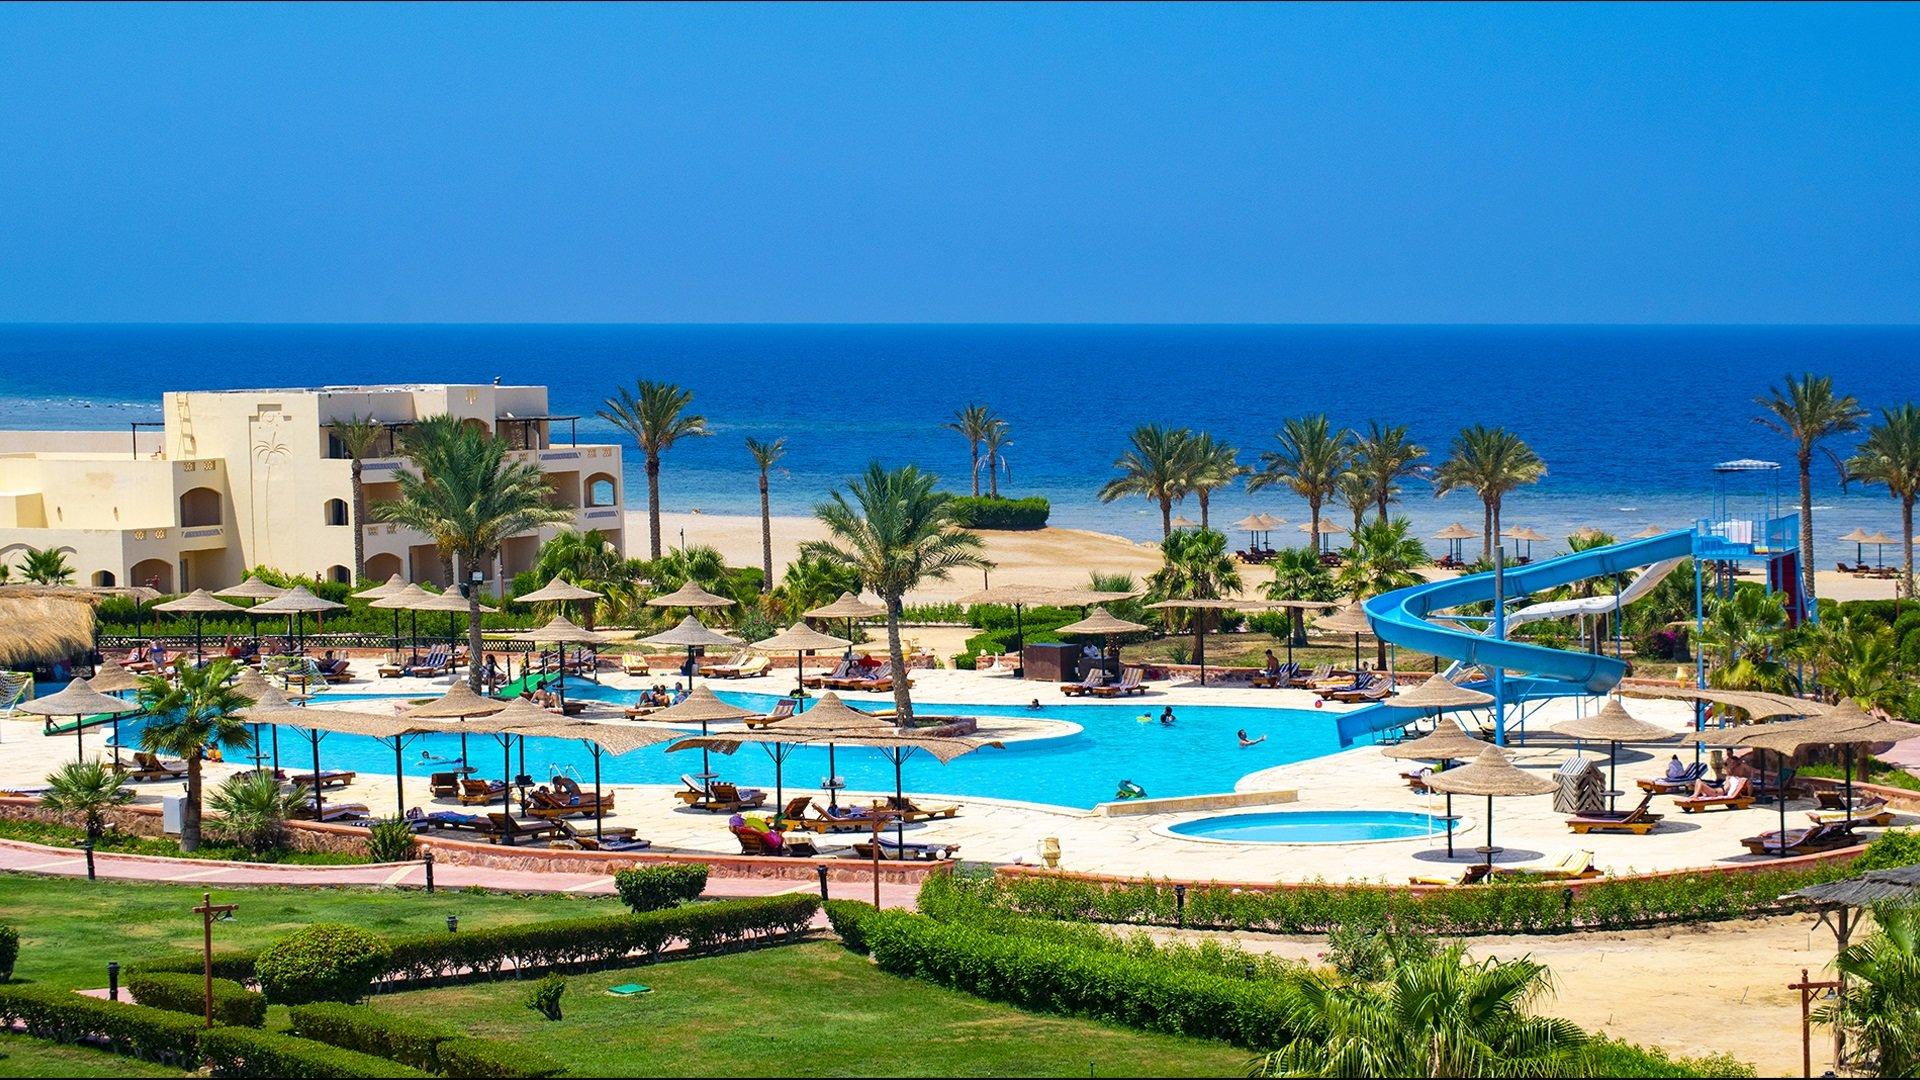 Hotel Jolie Beach